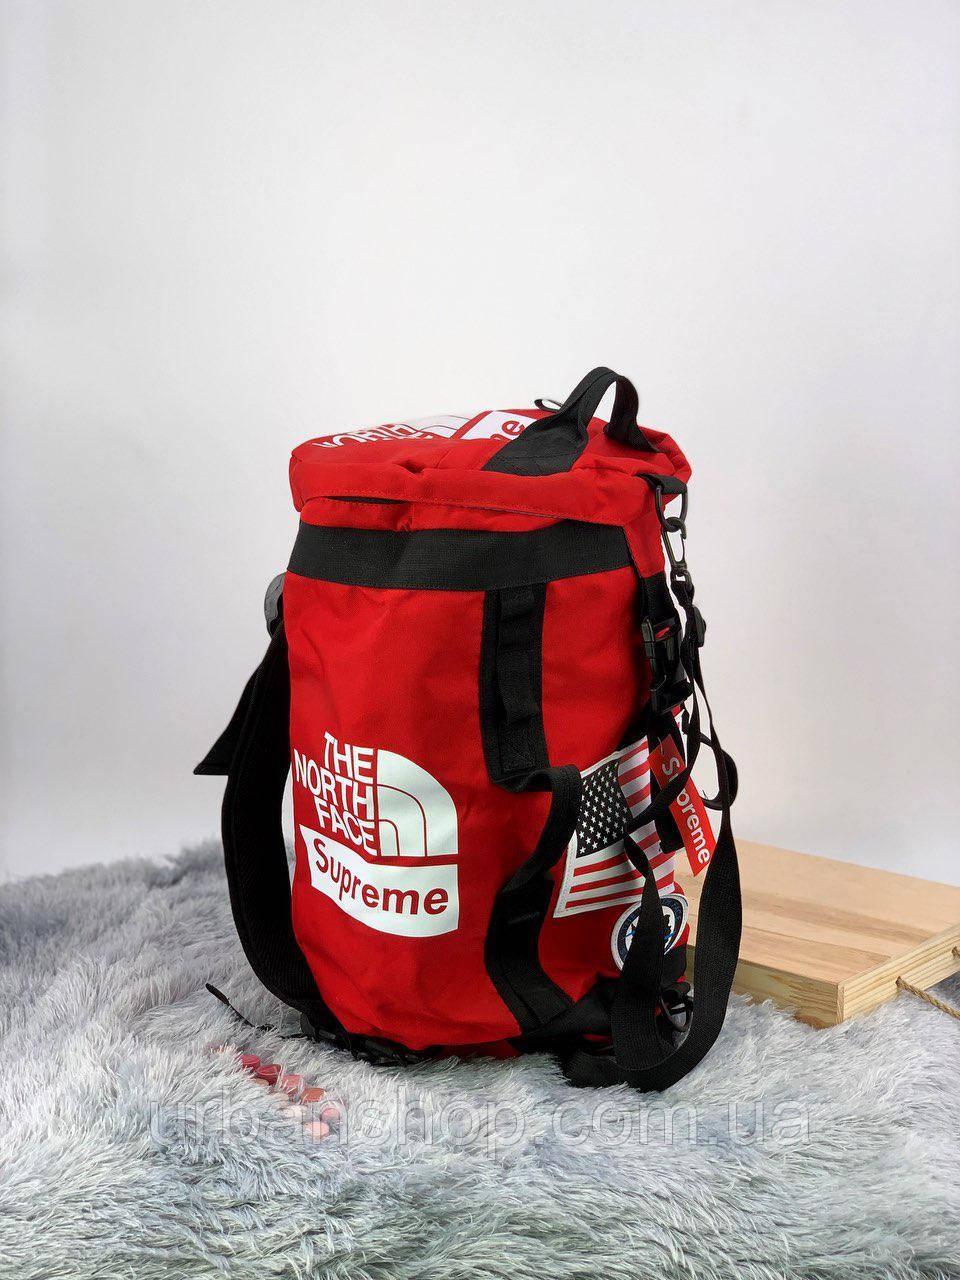 e698617a3fbd Купить Рюкзак TNF x Supreme - спортивна сумка в Интернет-магазине ...